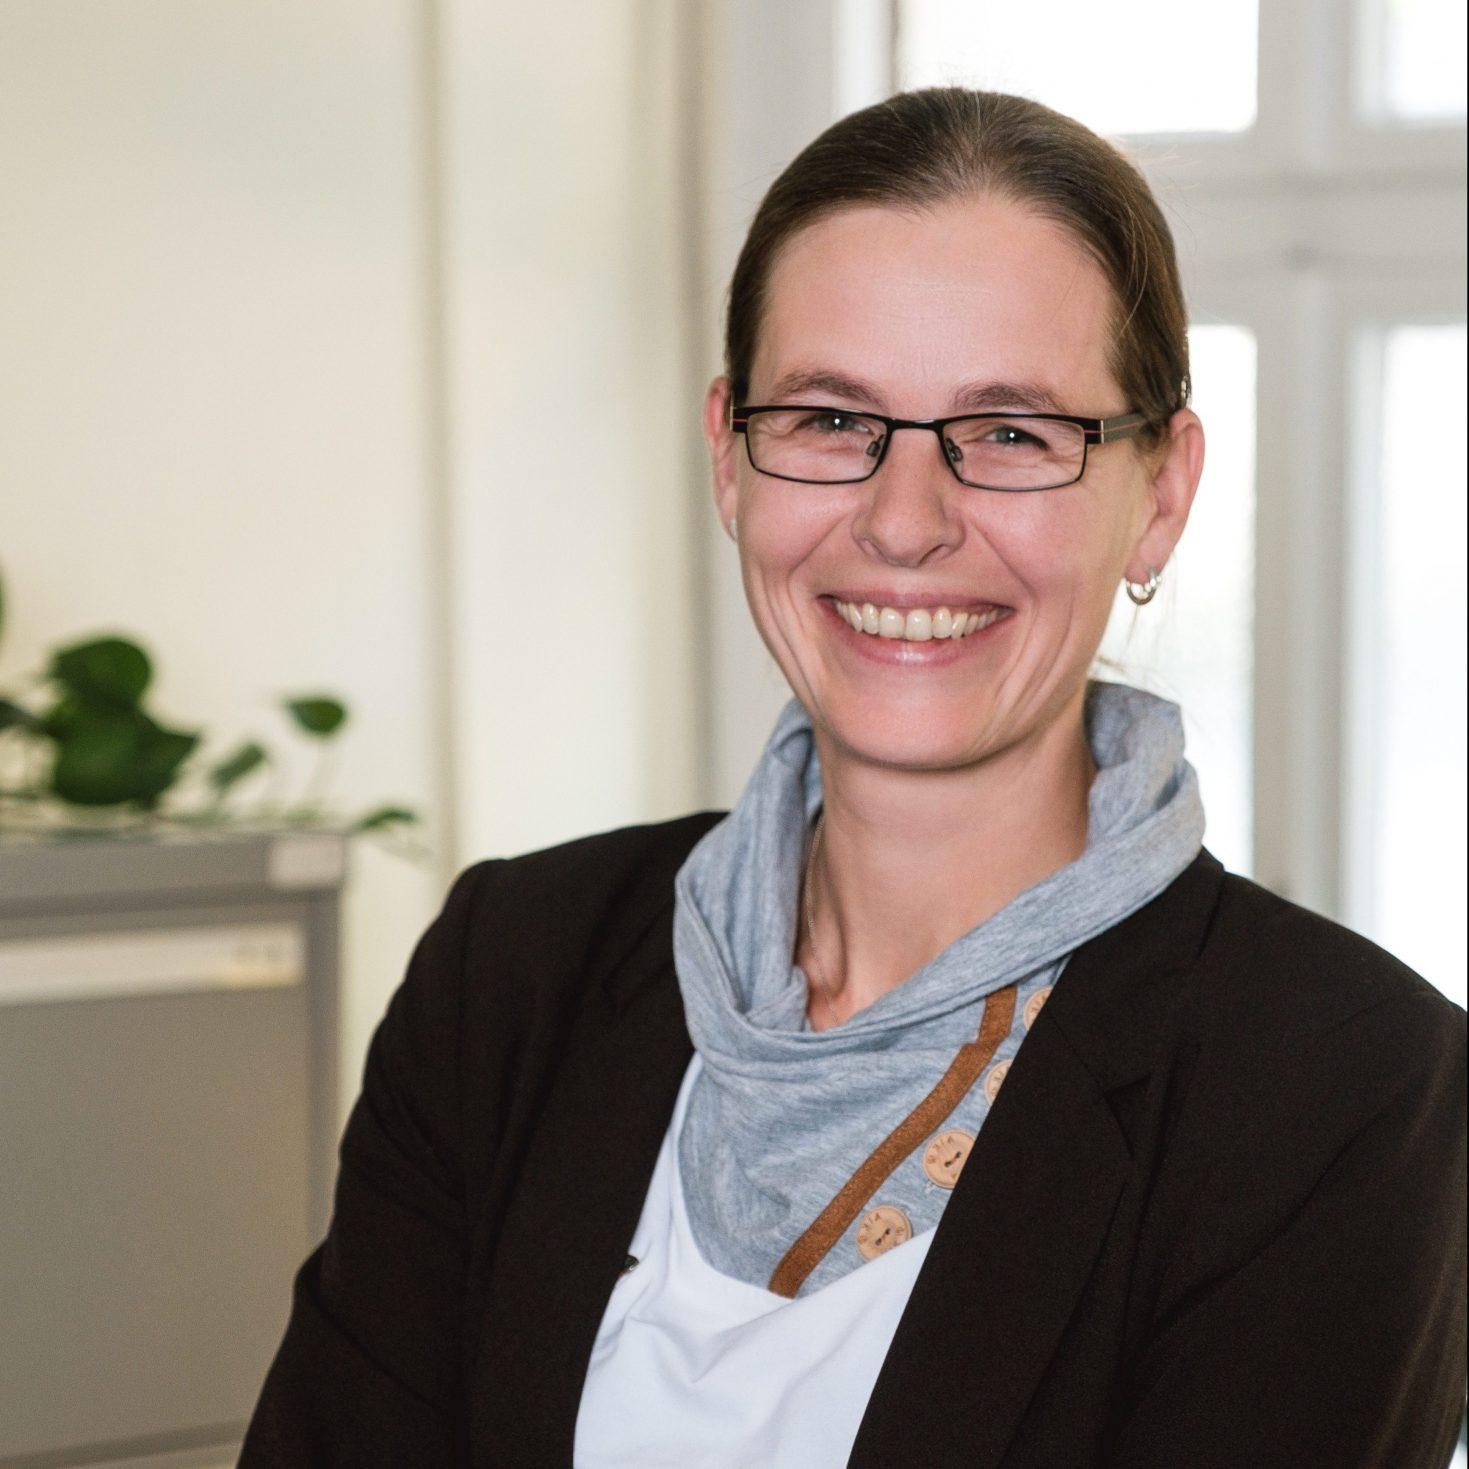 Cindy Elmenhorst